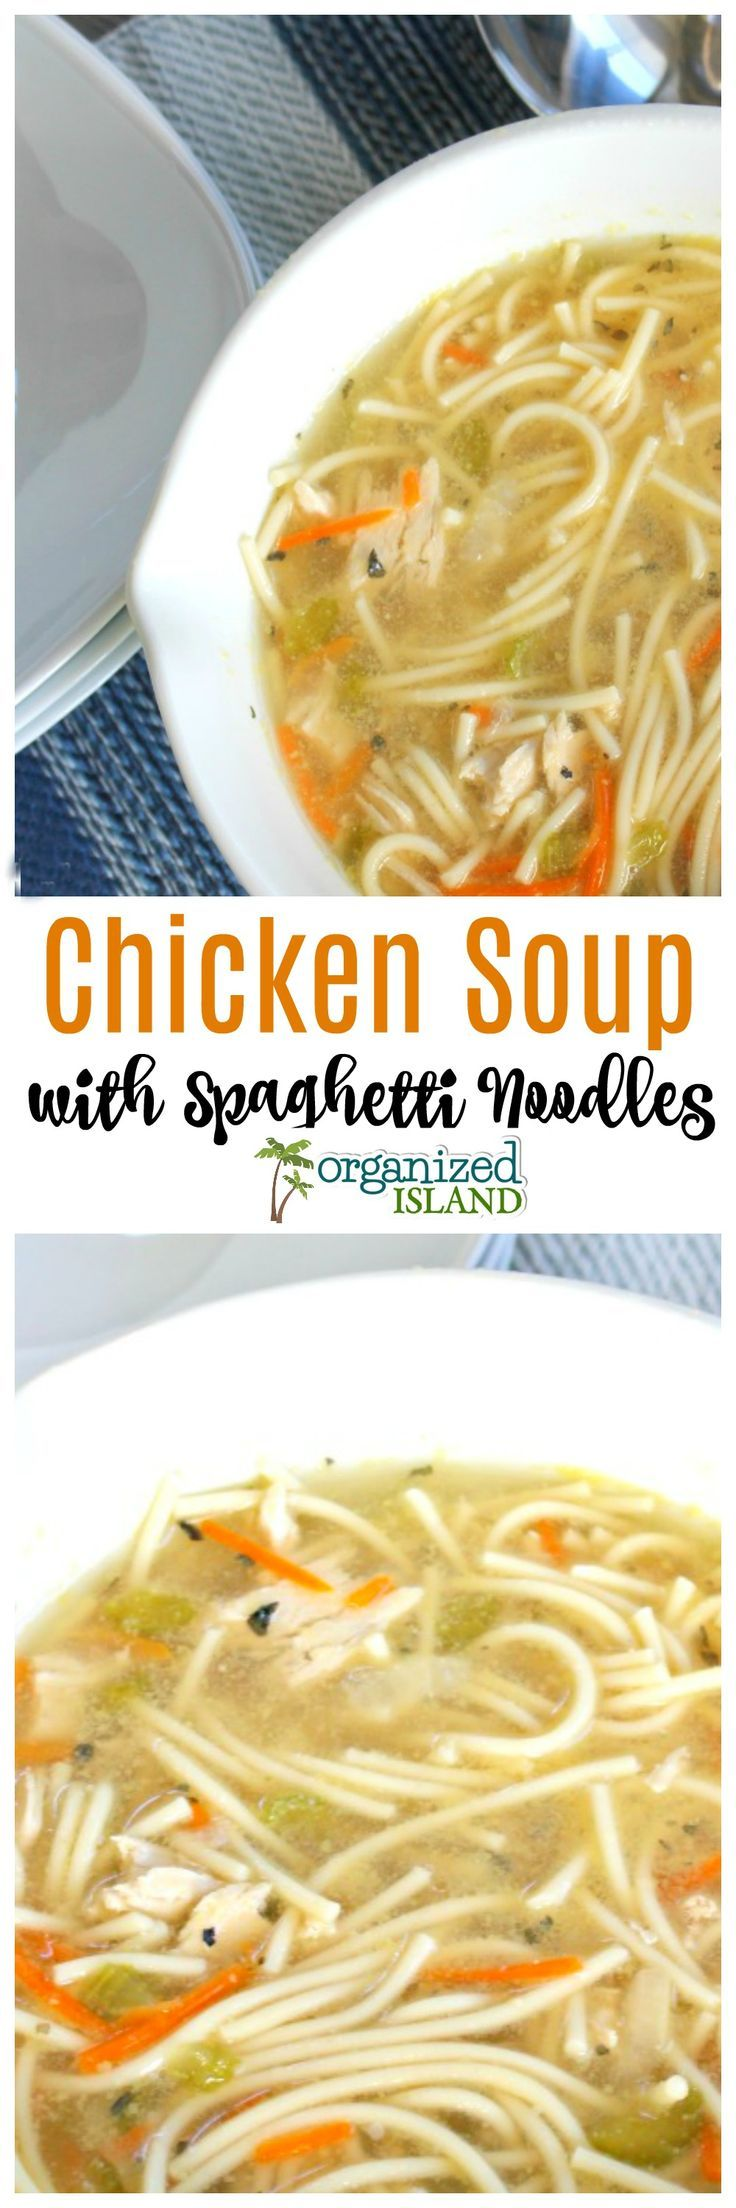 Chicken Soup With Spaghetti Noodles via @OCRaquel